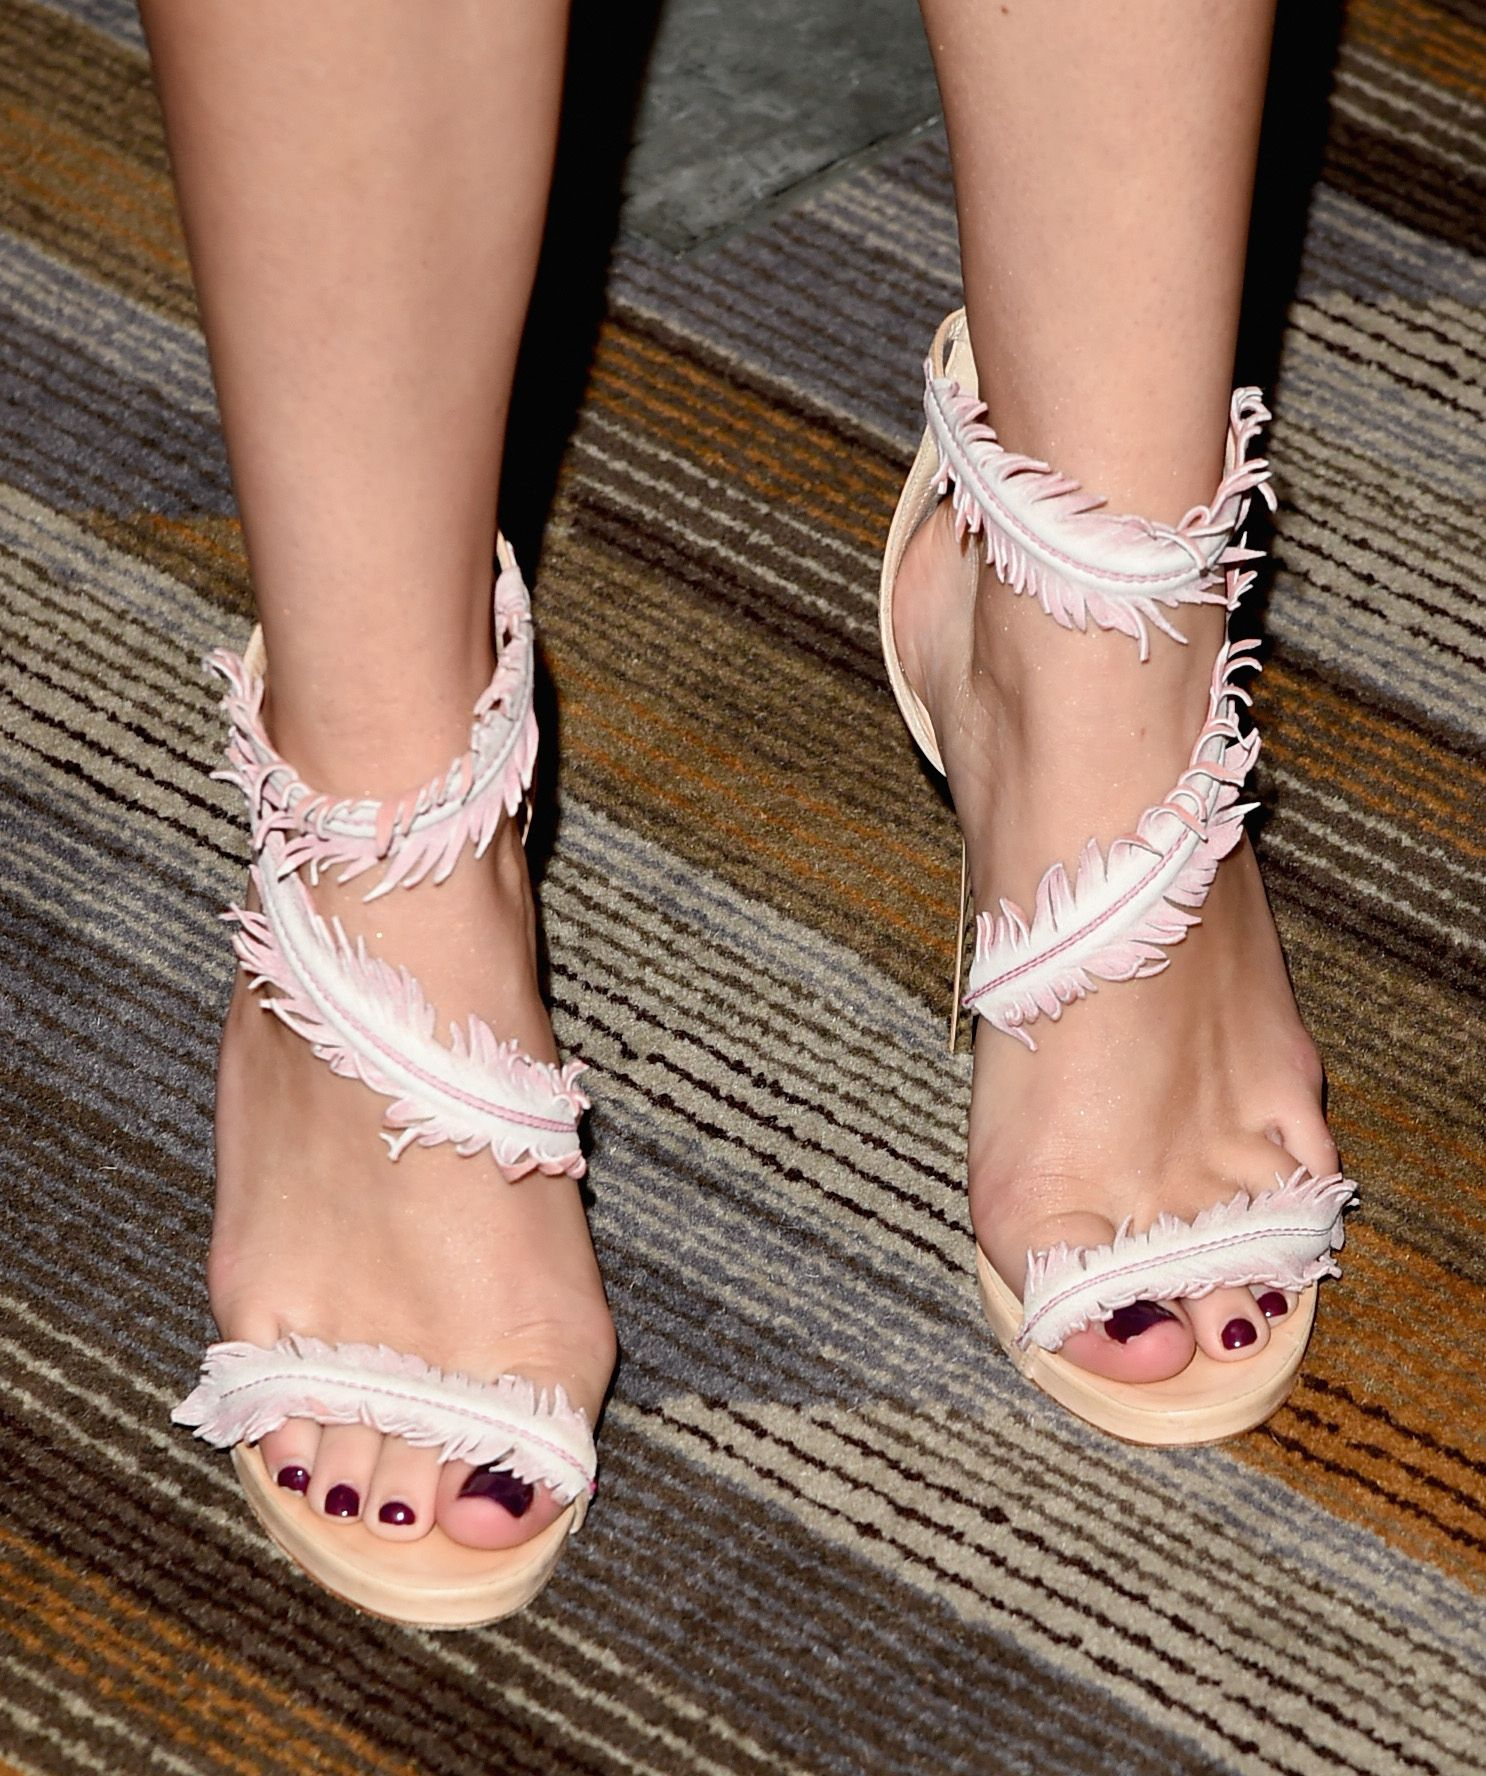 Bella Thorne Feet | WOW! This feet blow my mind it so good